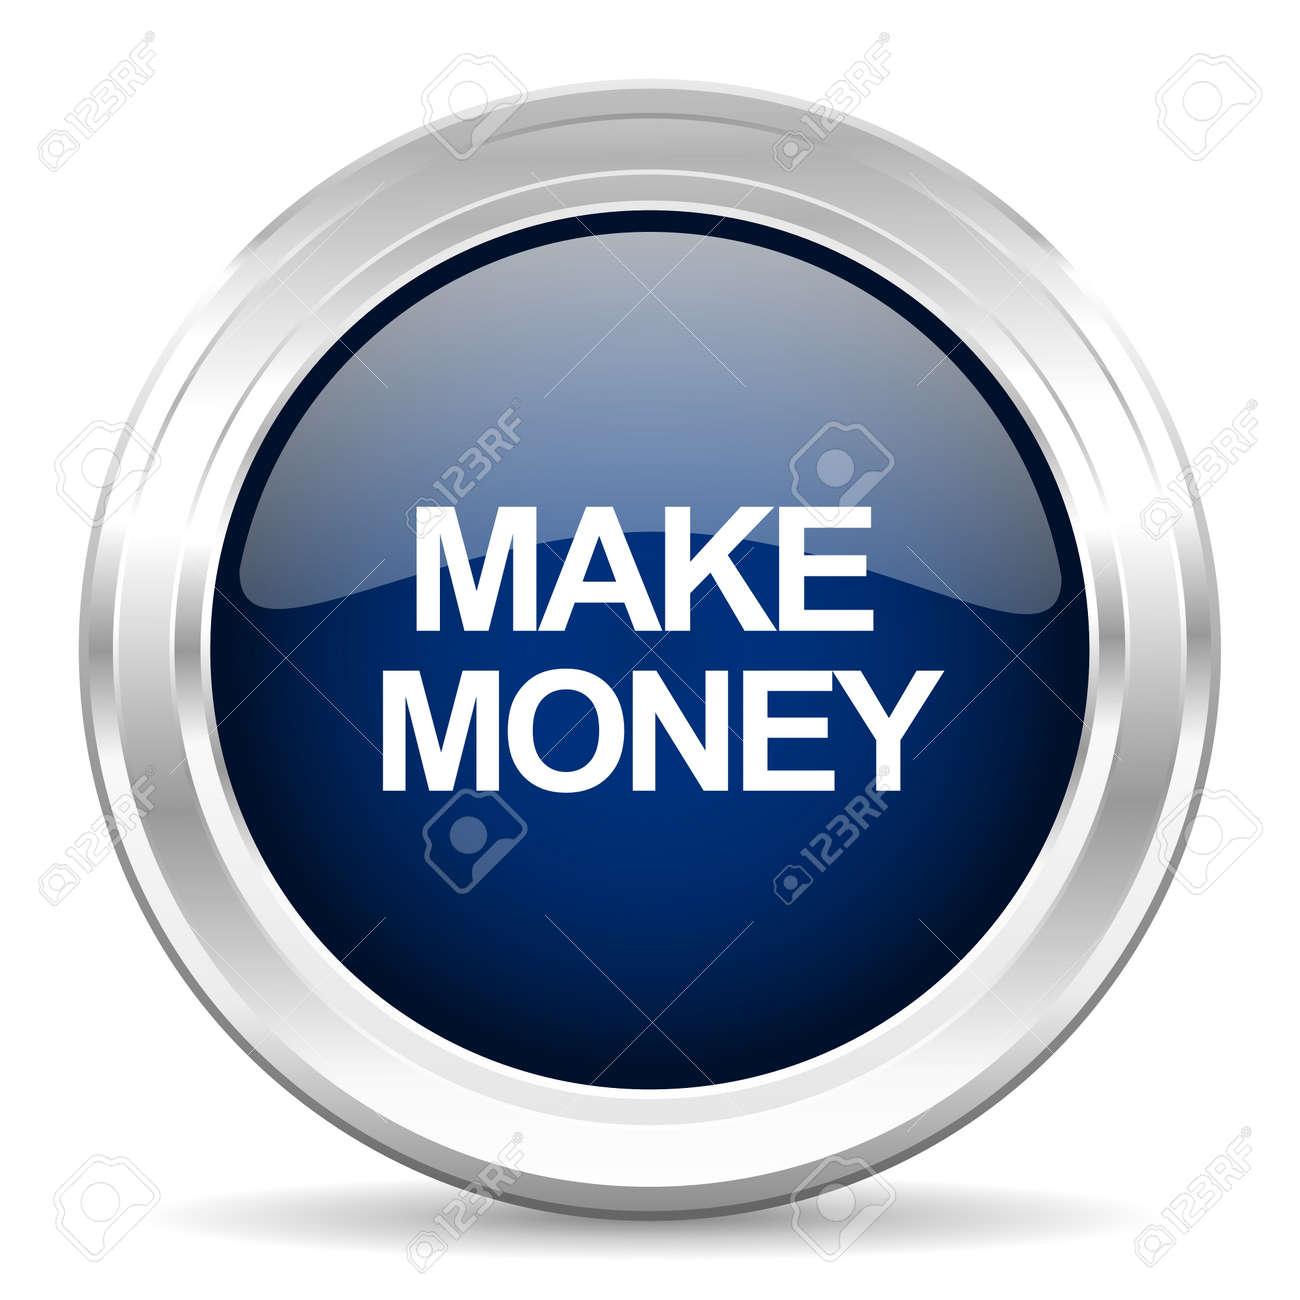 make money cirle glossy dark blue web icon on white background